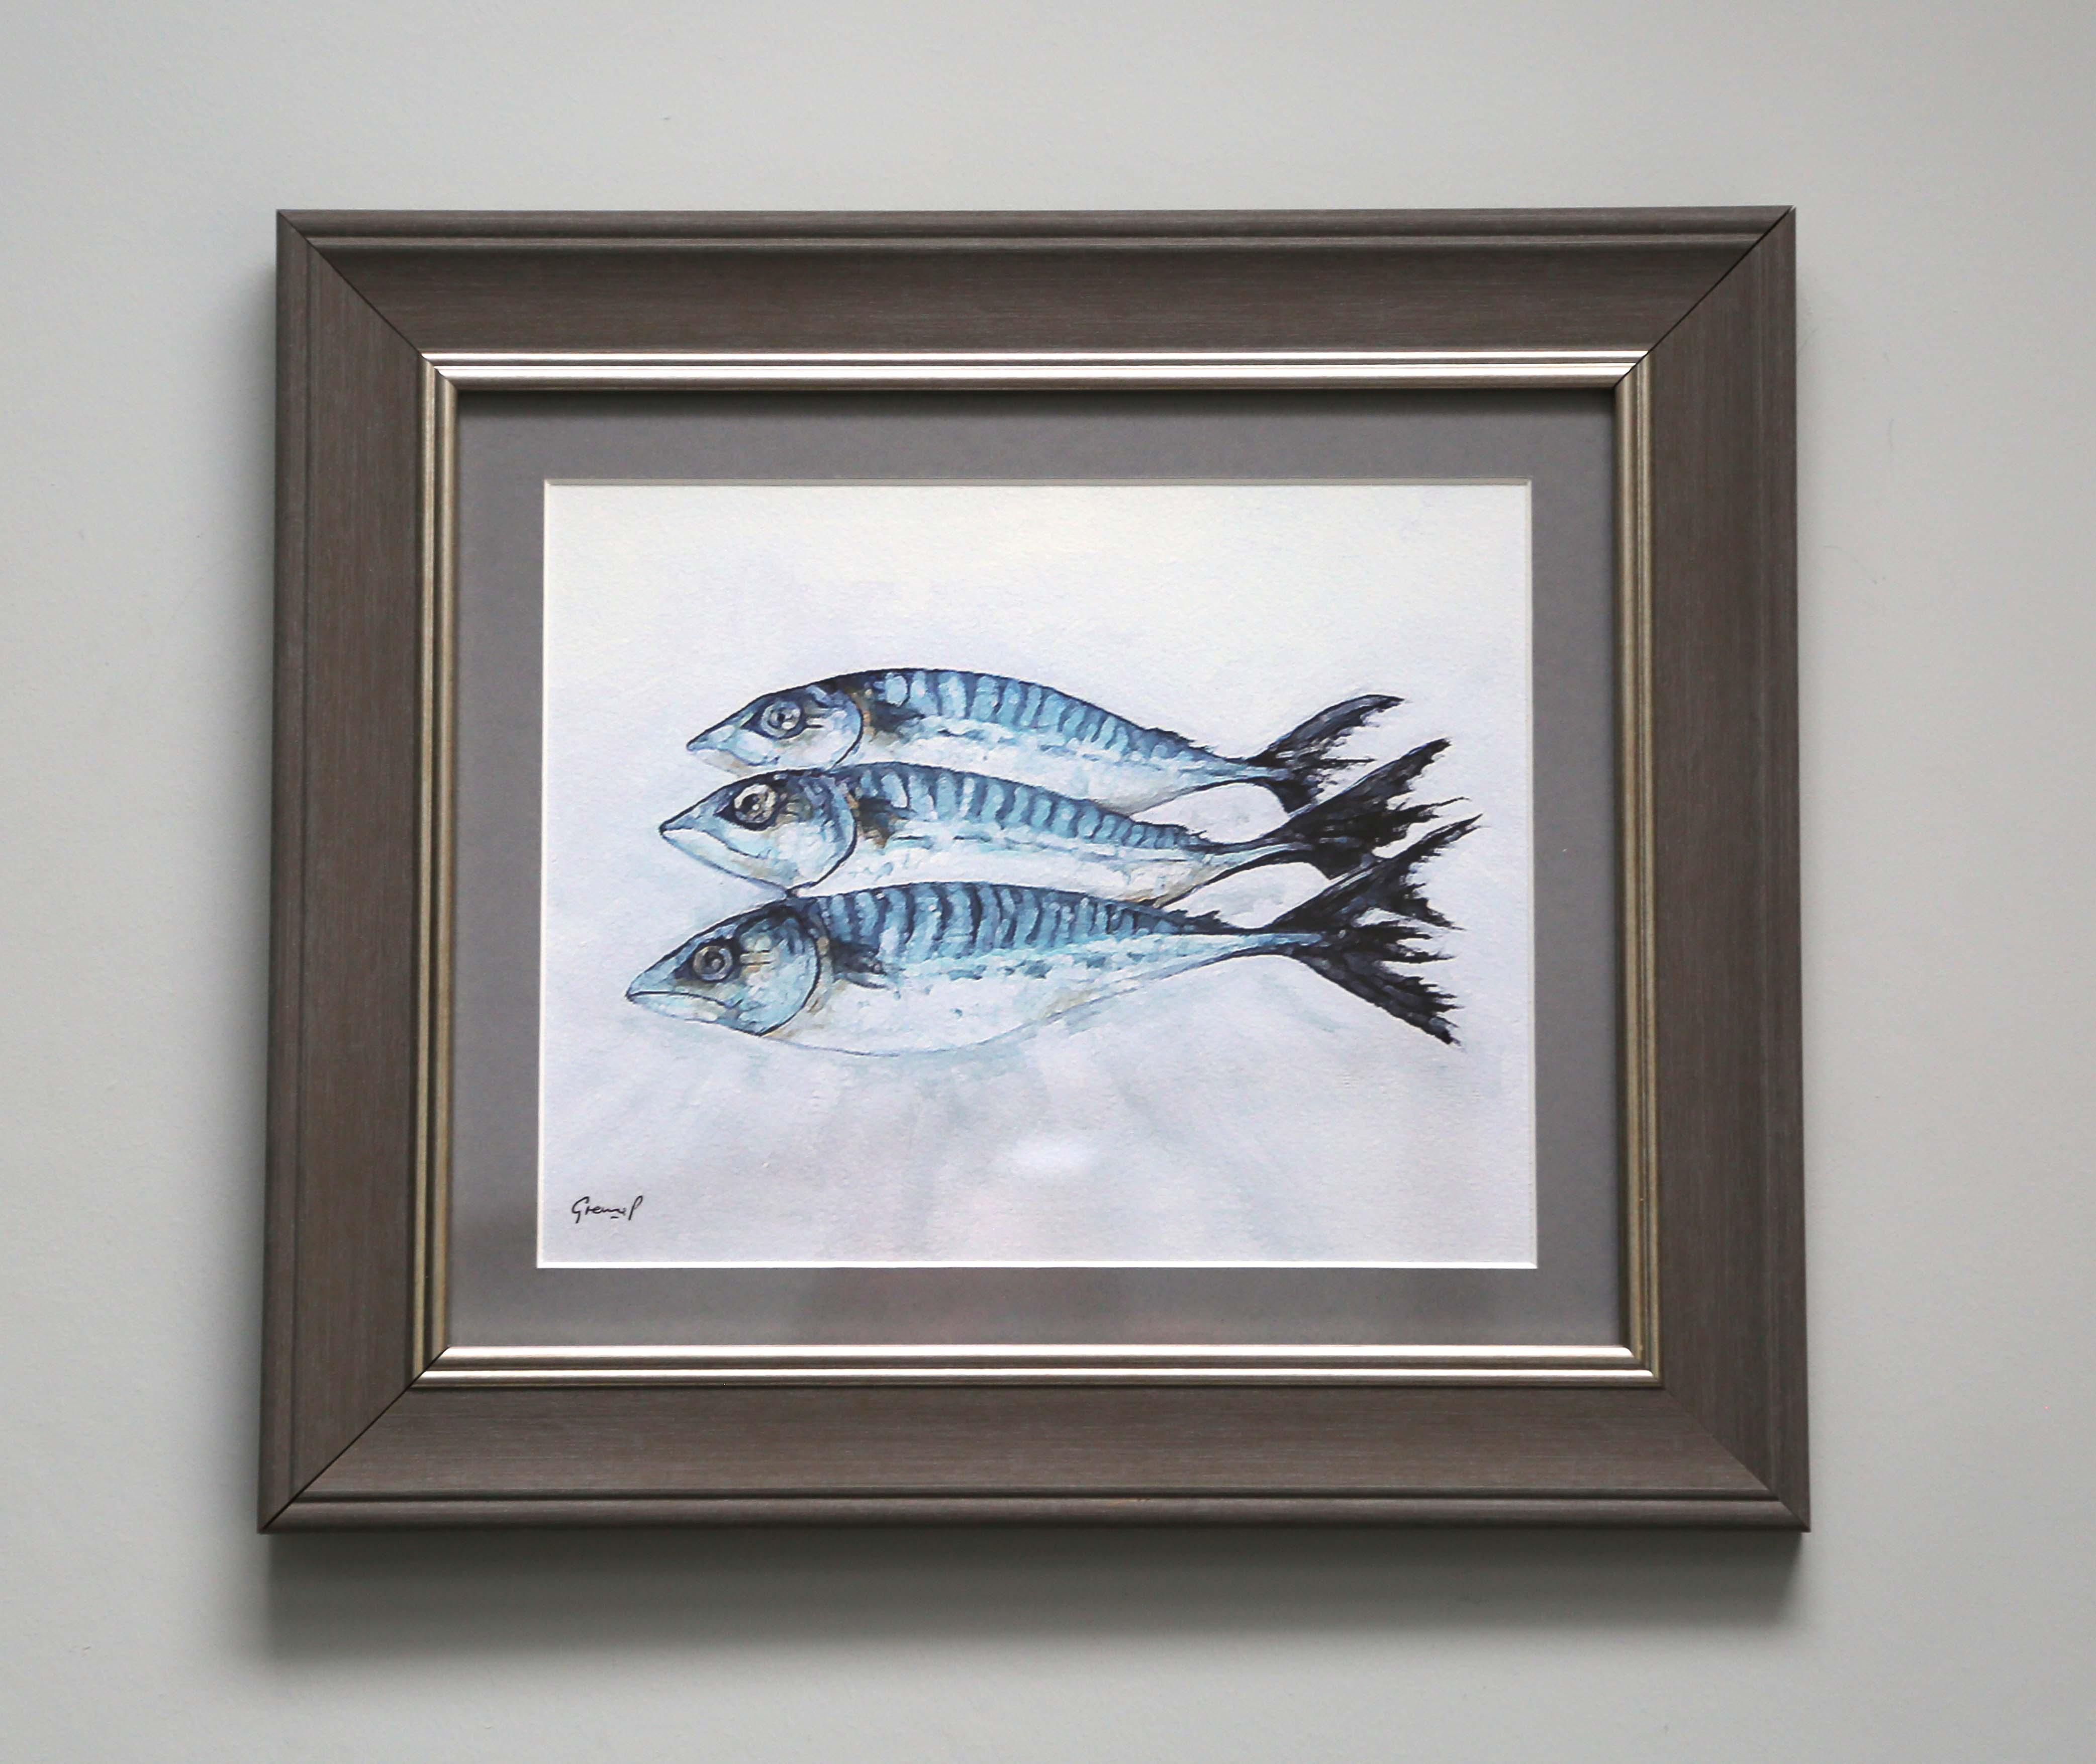 Mackerells surrey art